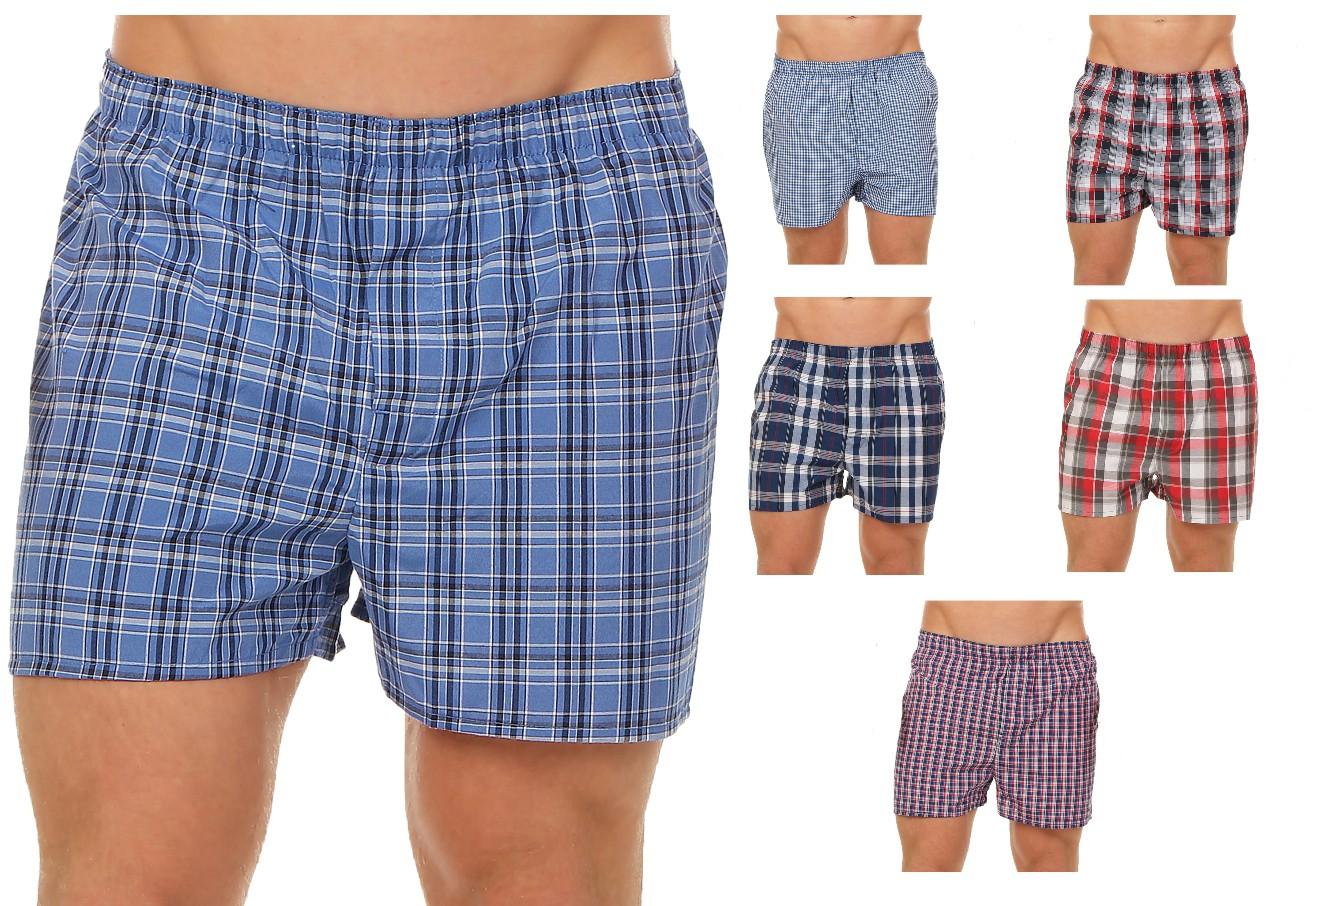 Herren Boxershorts American Style Karodesign Webboxer Shorts im 6er Pack 59542